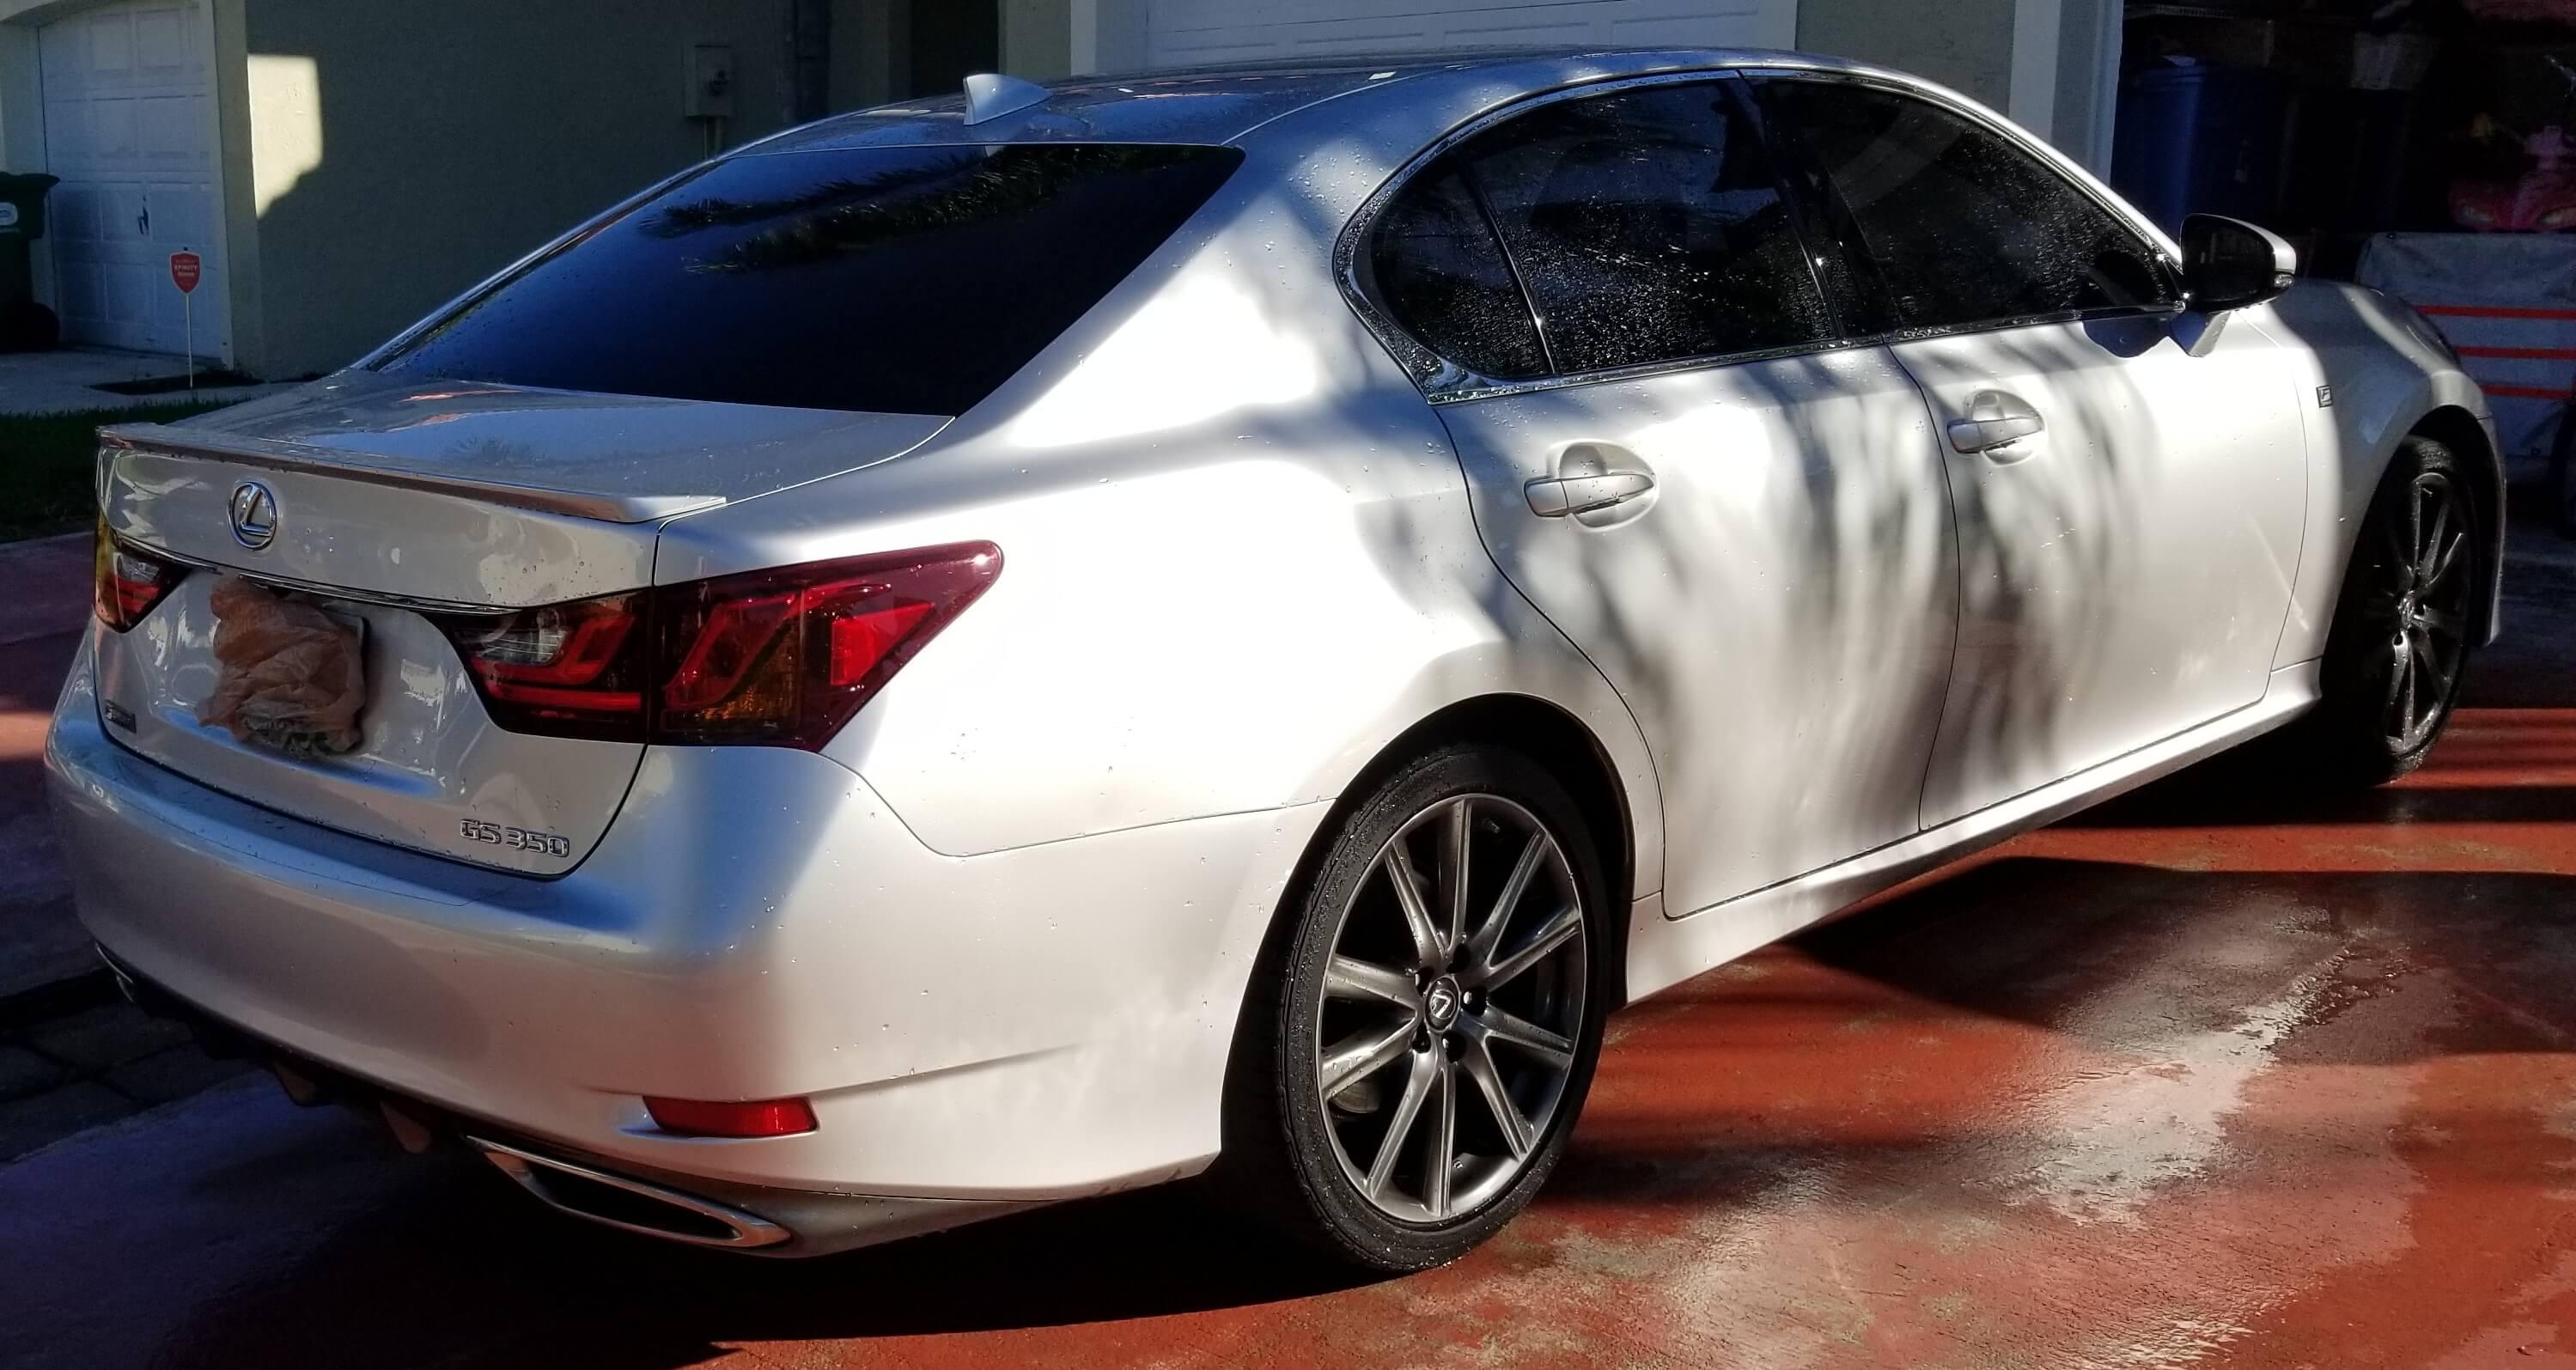 2015 Lexus GS 350 F Sport Lease Swap Marketplace Leasehackr Forum